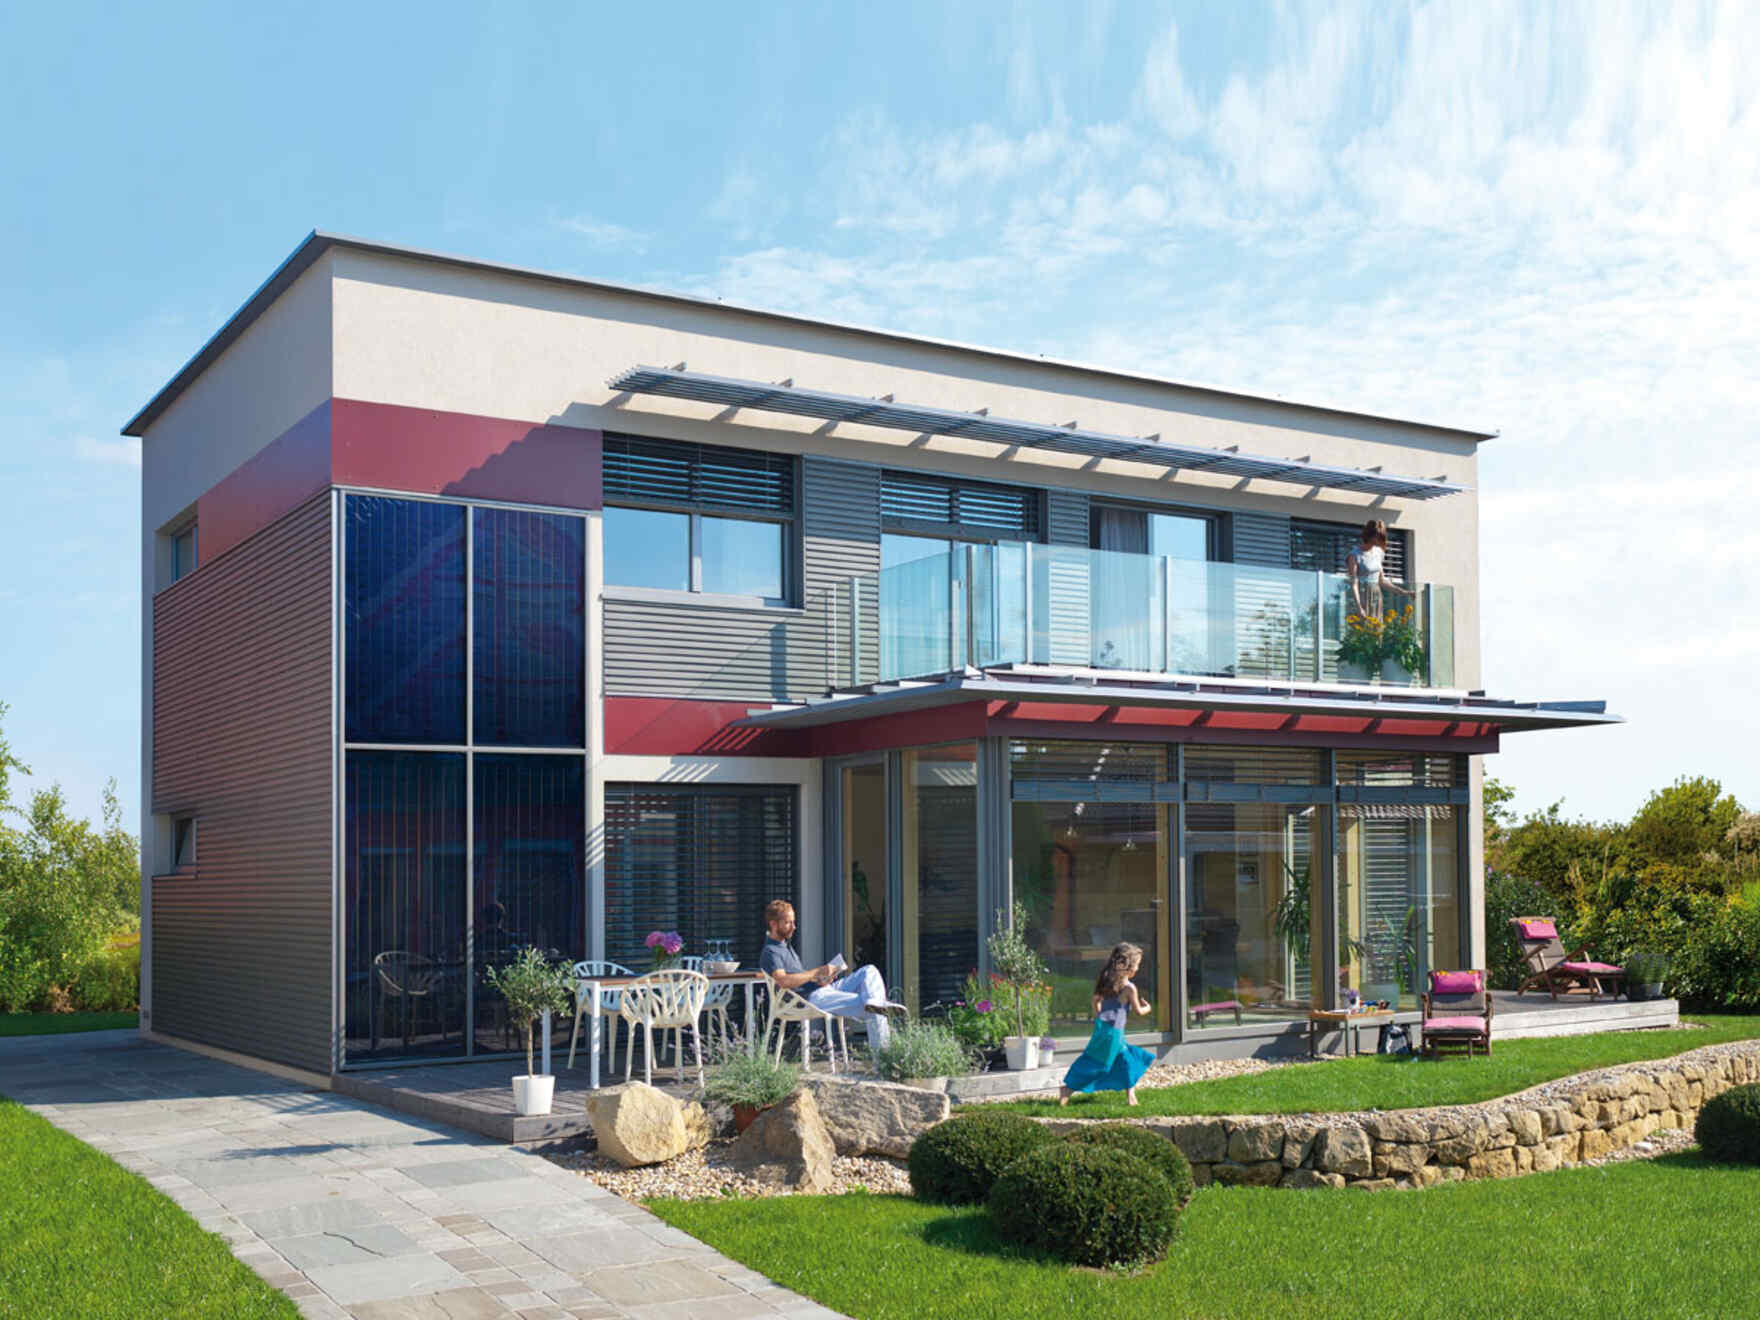 Musterhaus modern pultdach  Musterhaus Sunrise | Musterhäuser | Neues Zuhause | VARIO-HAUS ...